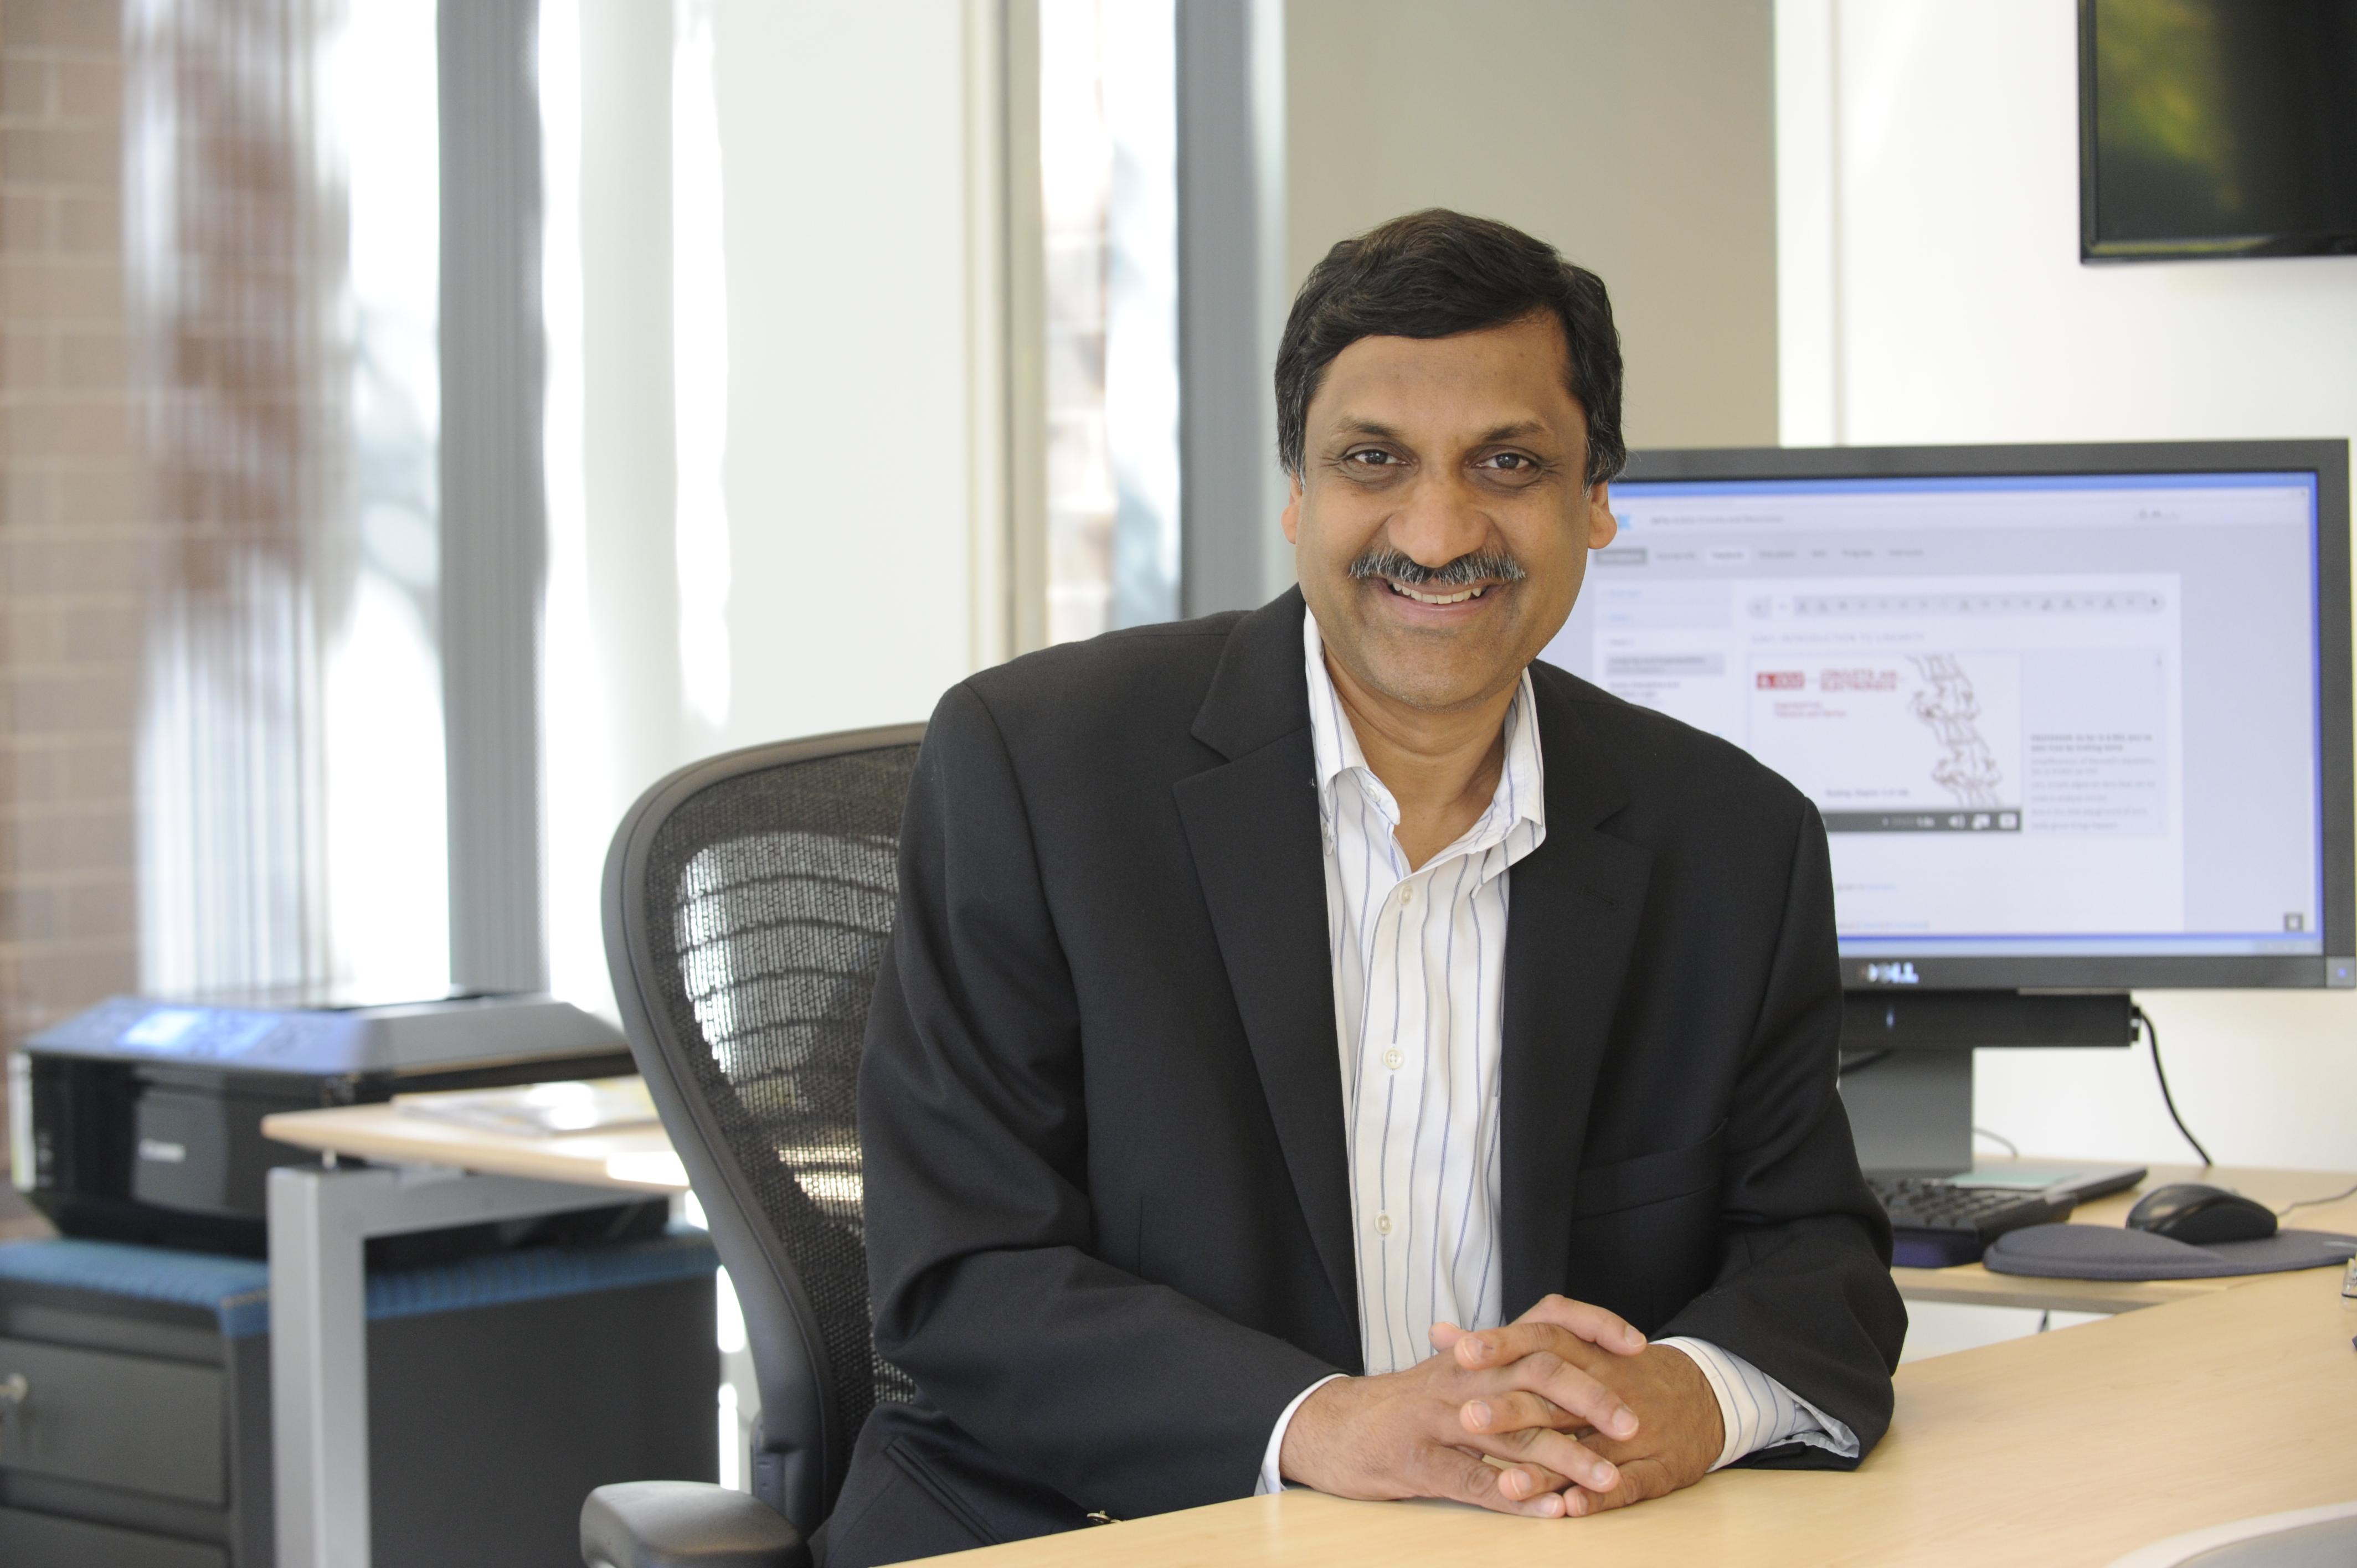 Anant Agarwal, edX CEO